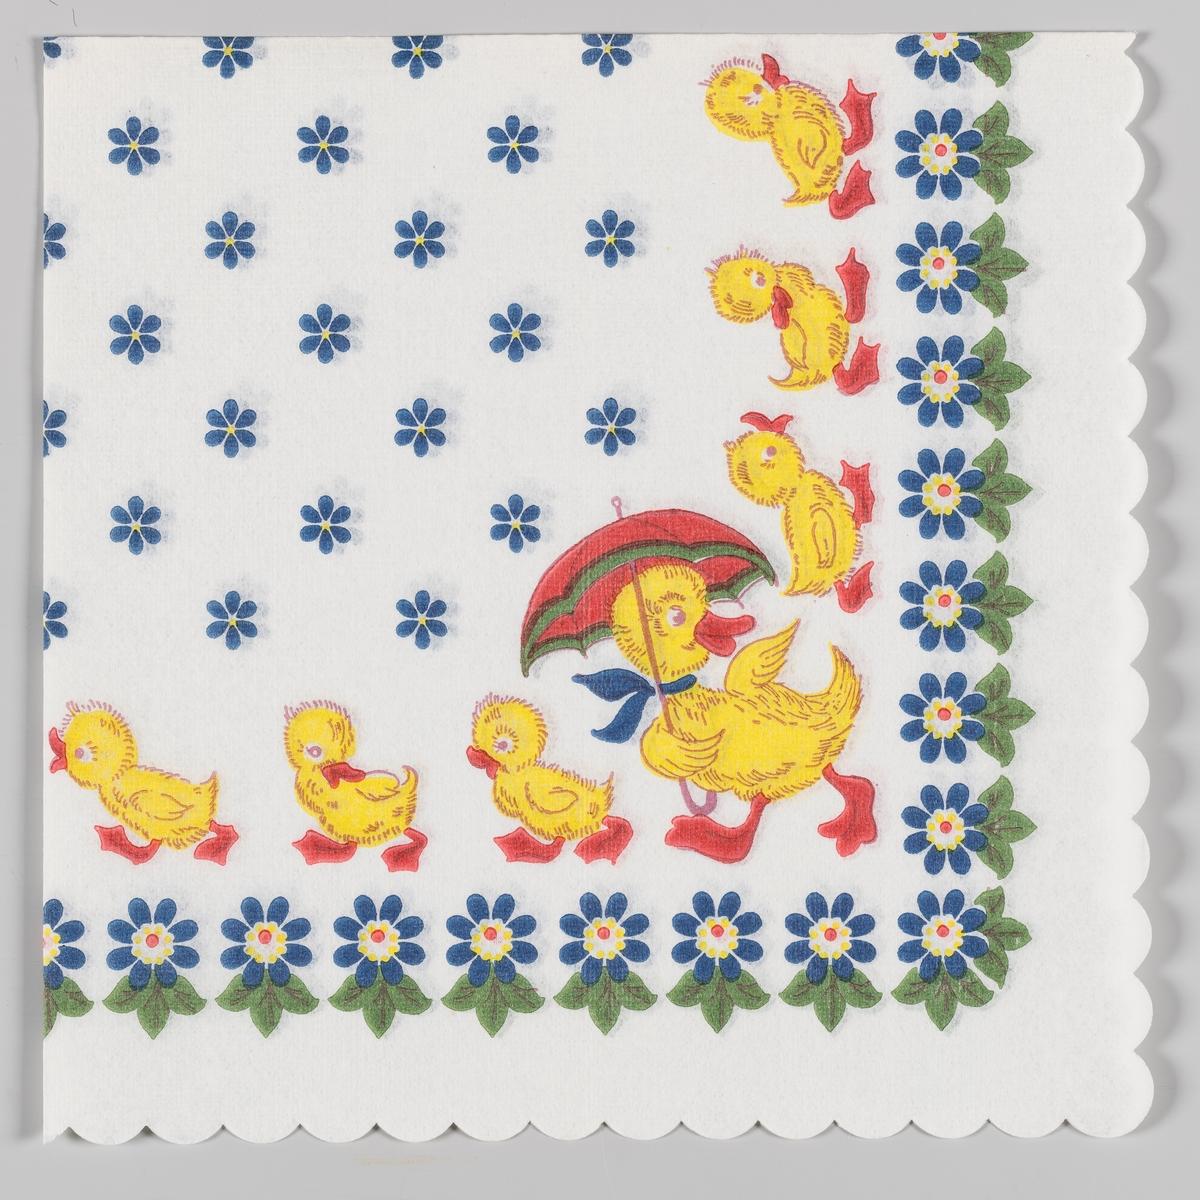 En and med paraply og blå sløyfe rundt halsen dirigerer en flokk med andunger. Blå blomster og grønne blader.